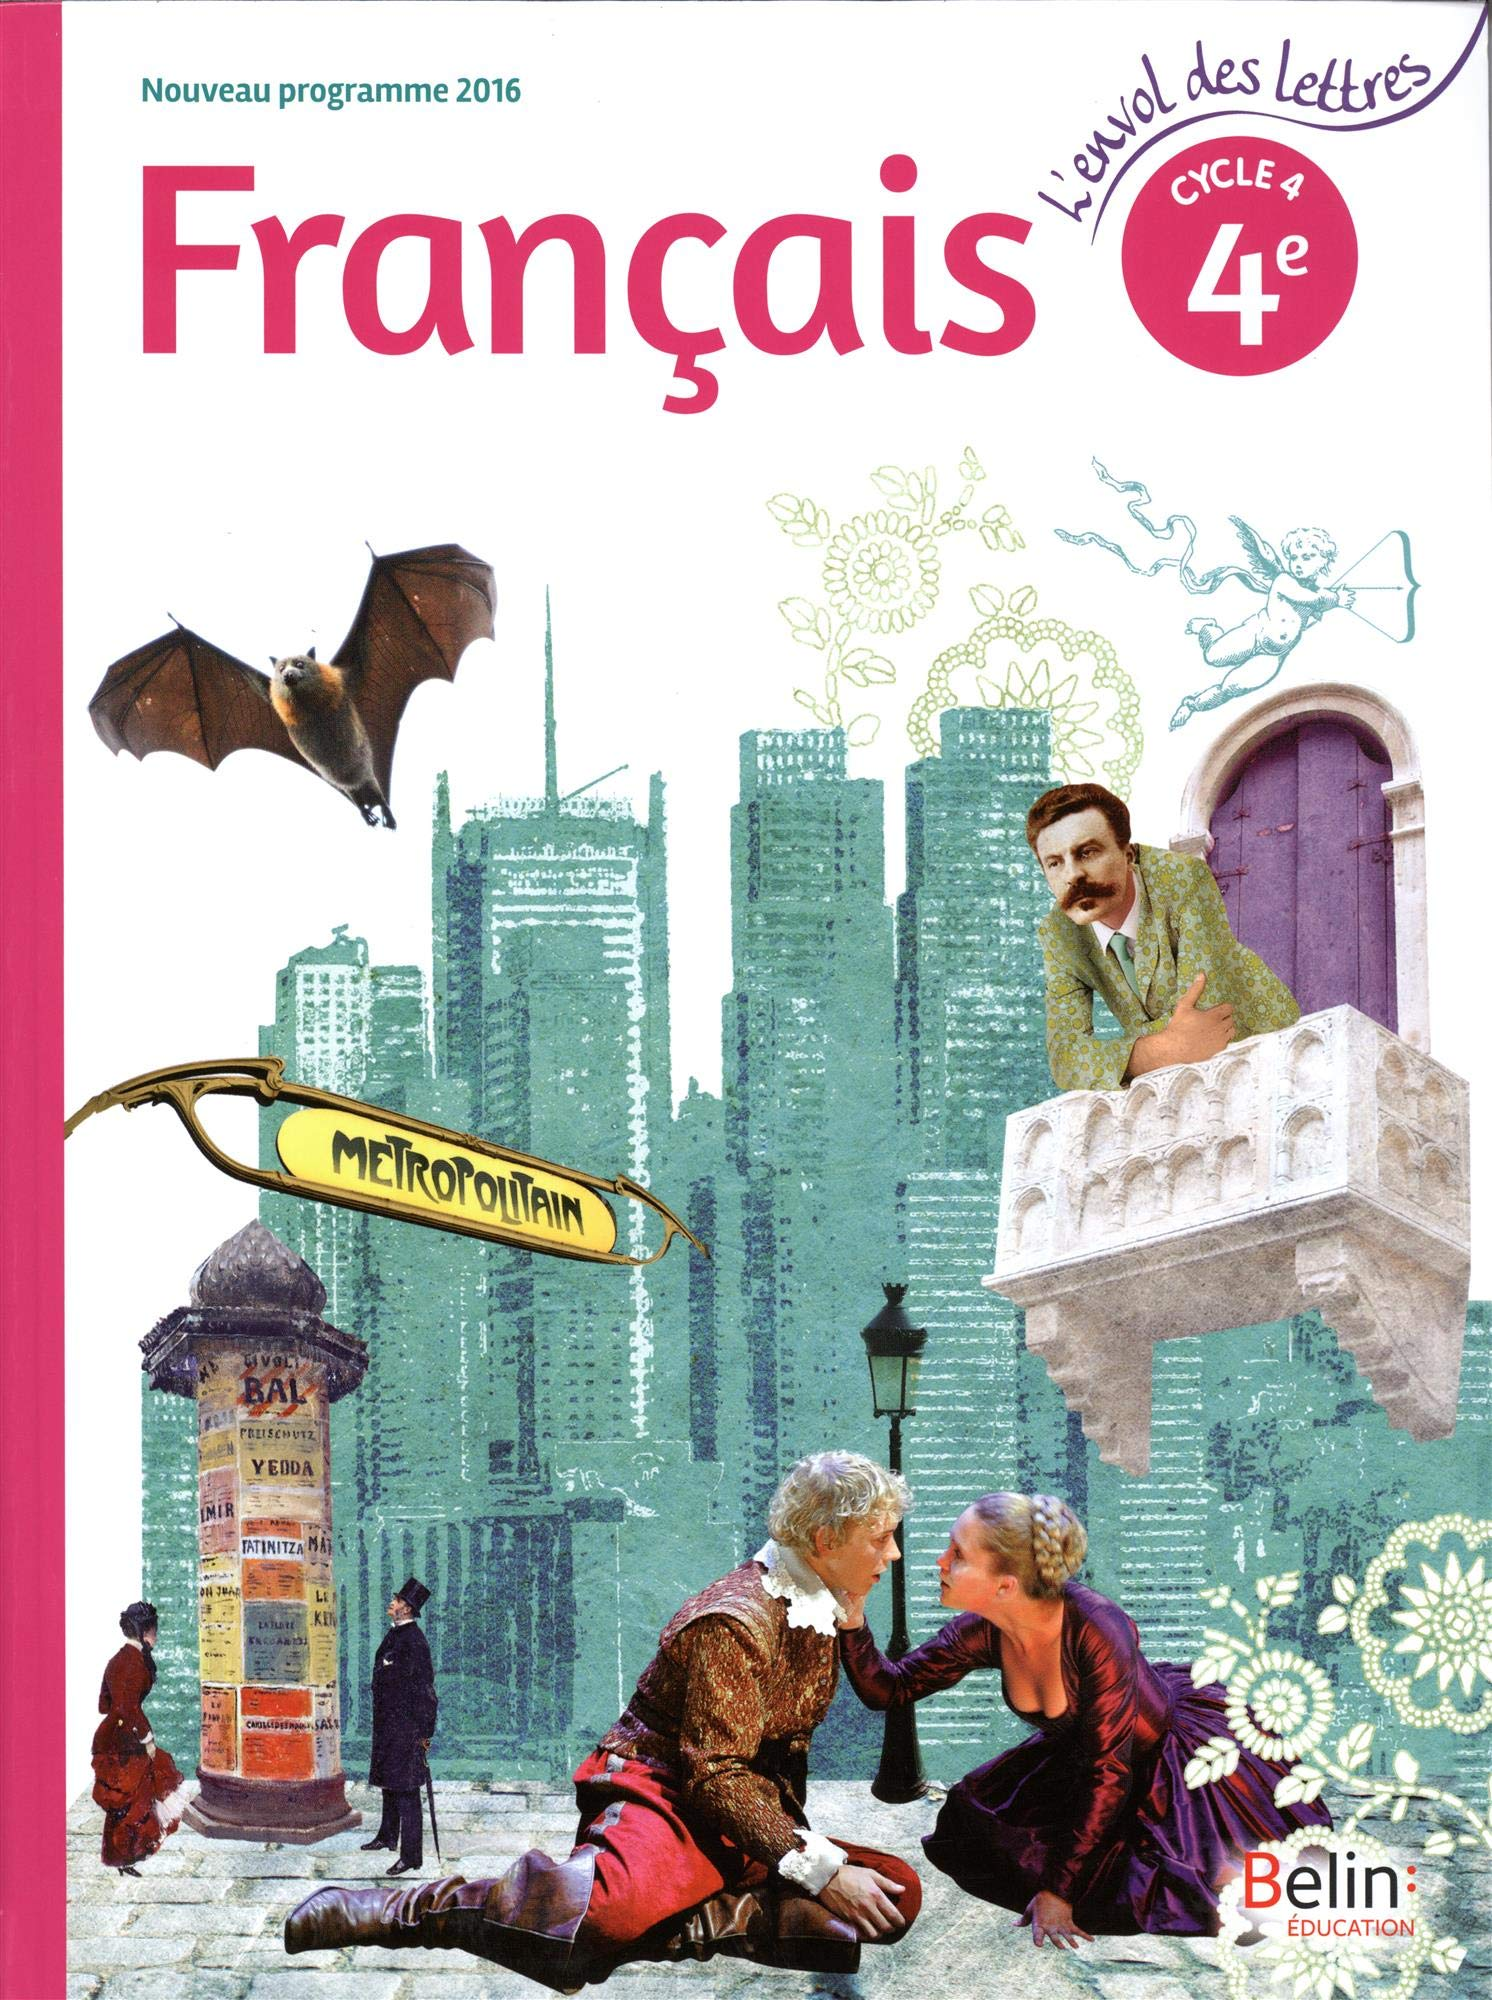 Francais 4e Cycle 4 Livre De L Eleve Emmanuel Broc